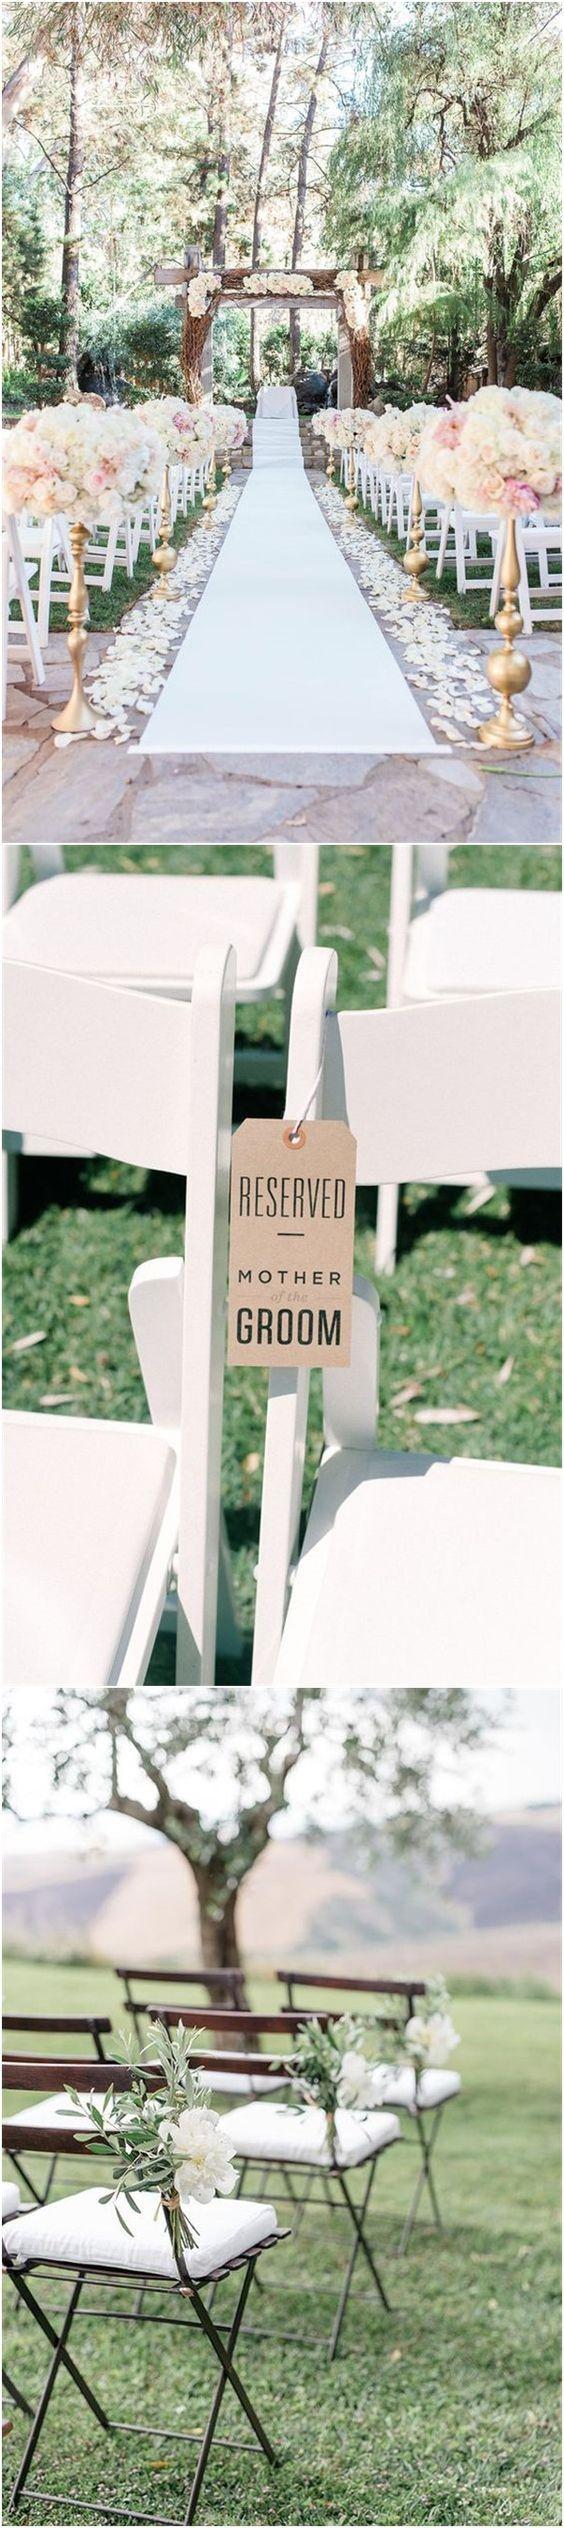 25 Rustic Outdoor Wedding Ceremony Decorations Ideas   Rustic ...